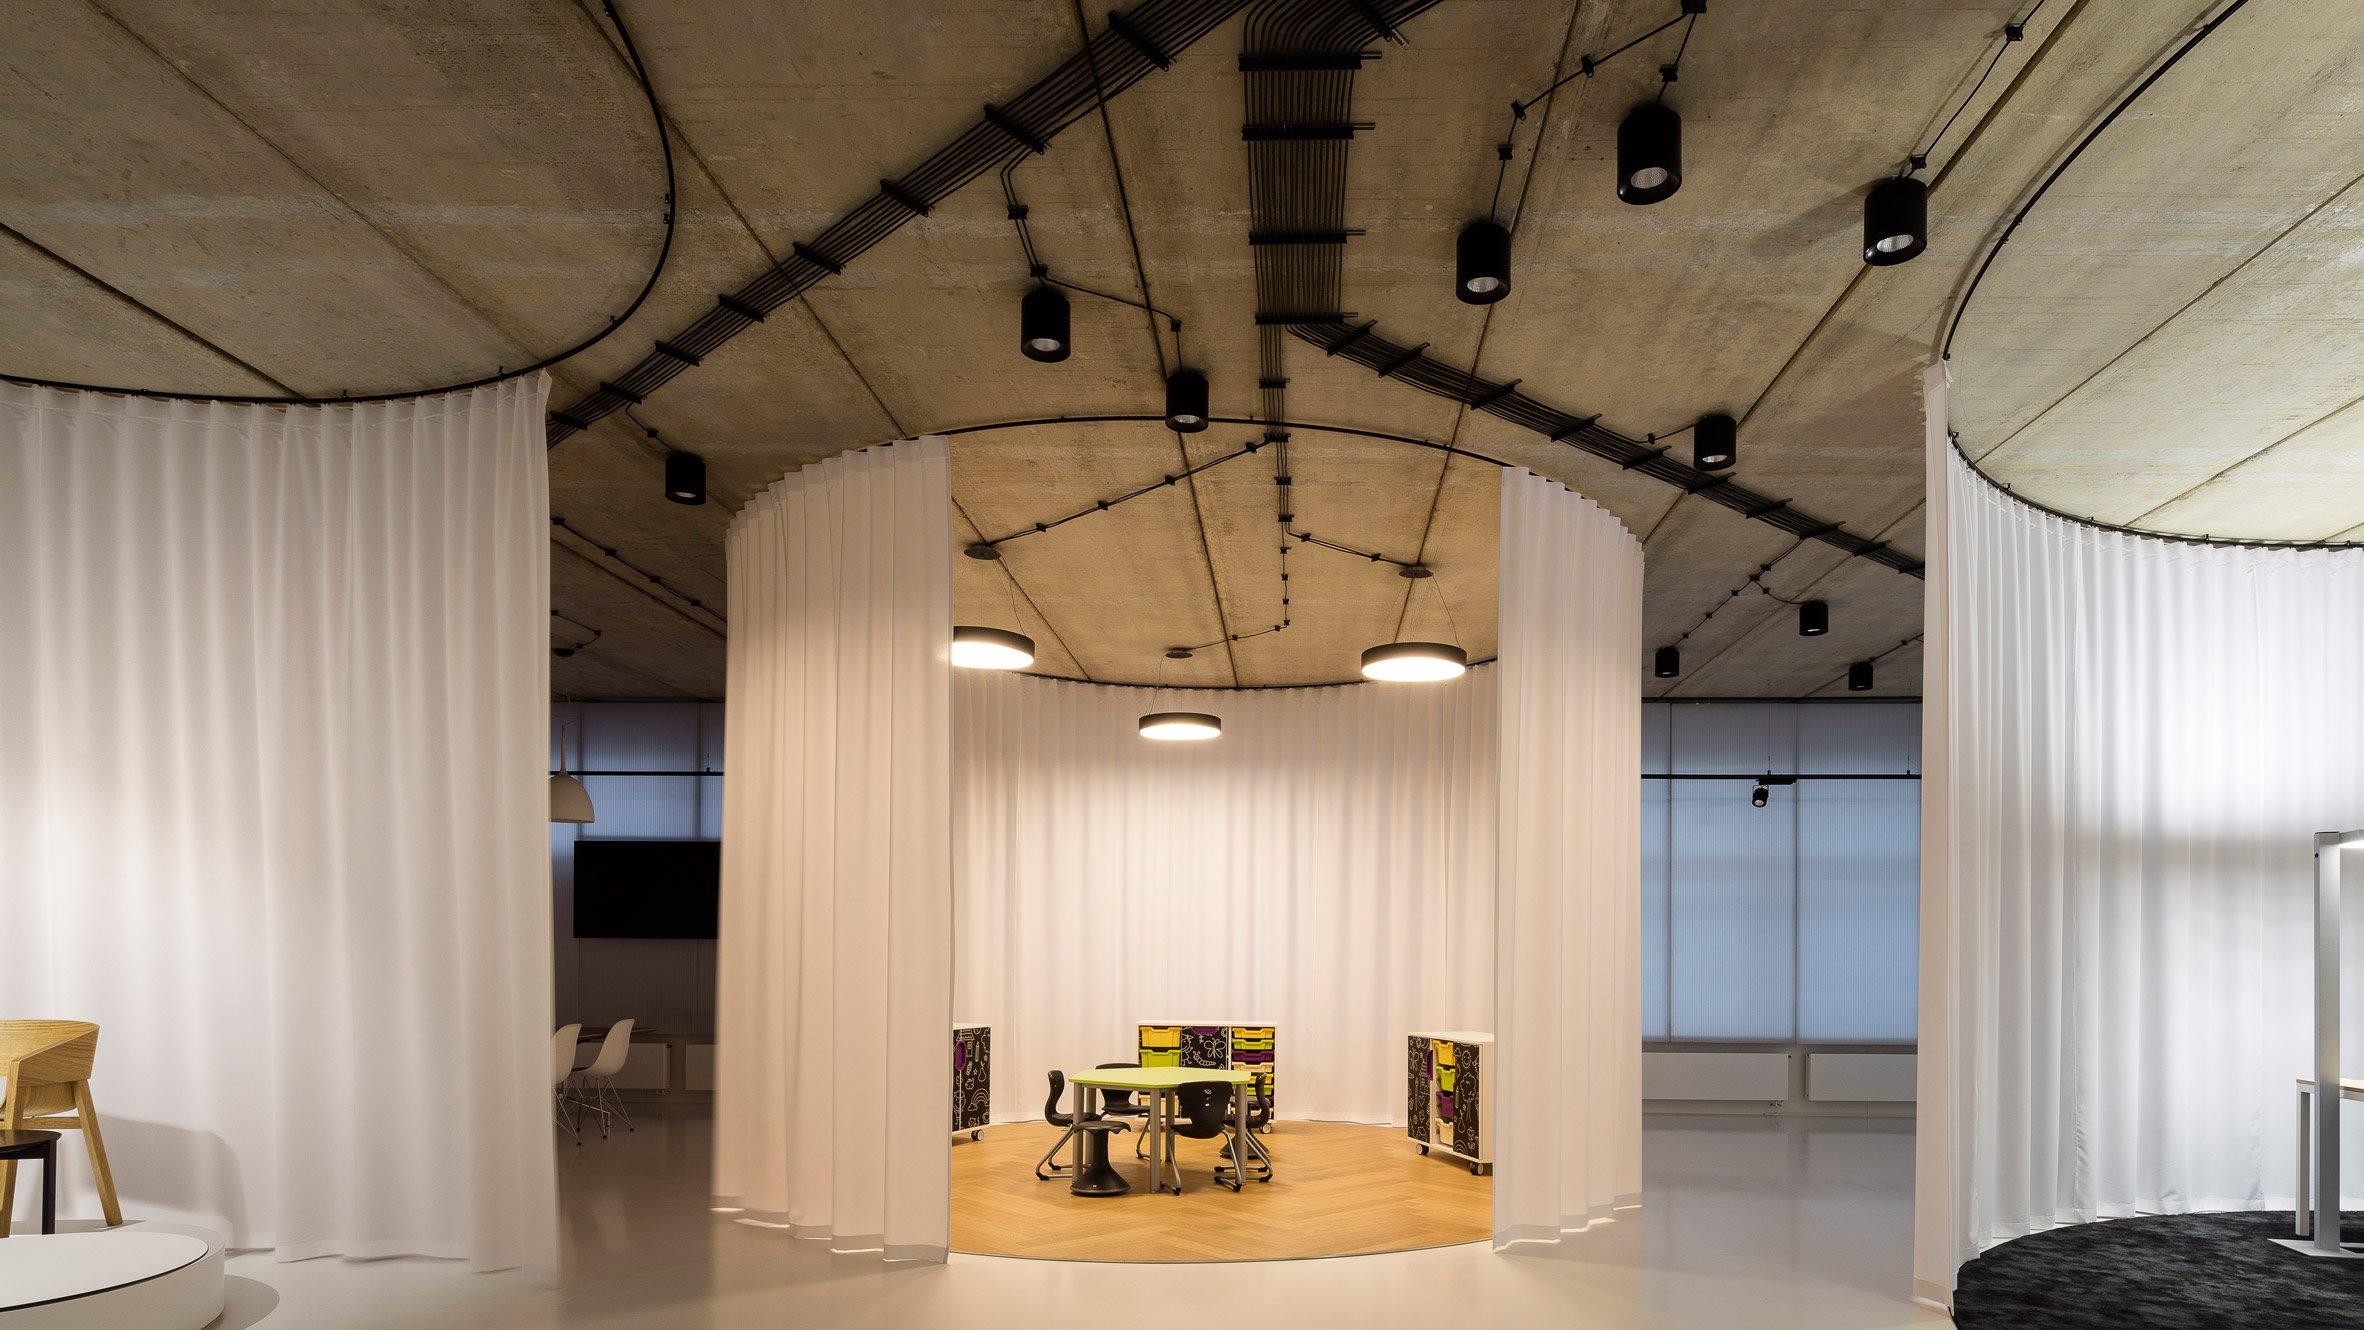 gallery-furniture-chybik-kistof-architecture-retail-czech-republic_dezeen_hero-b.jpg